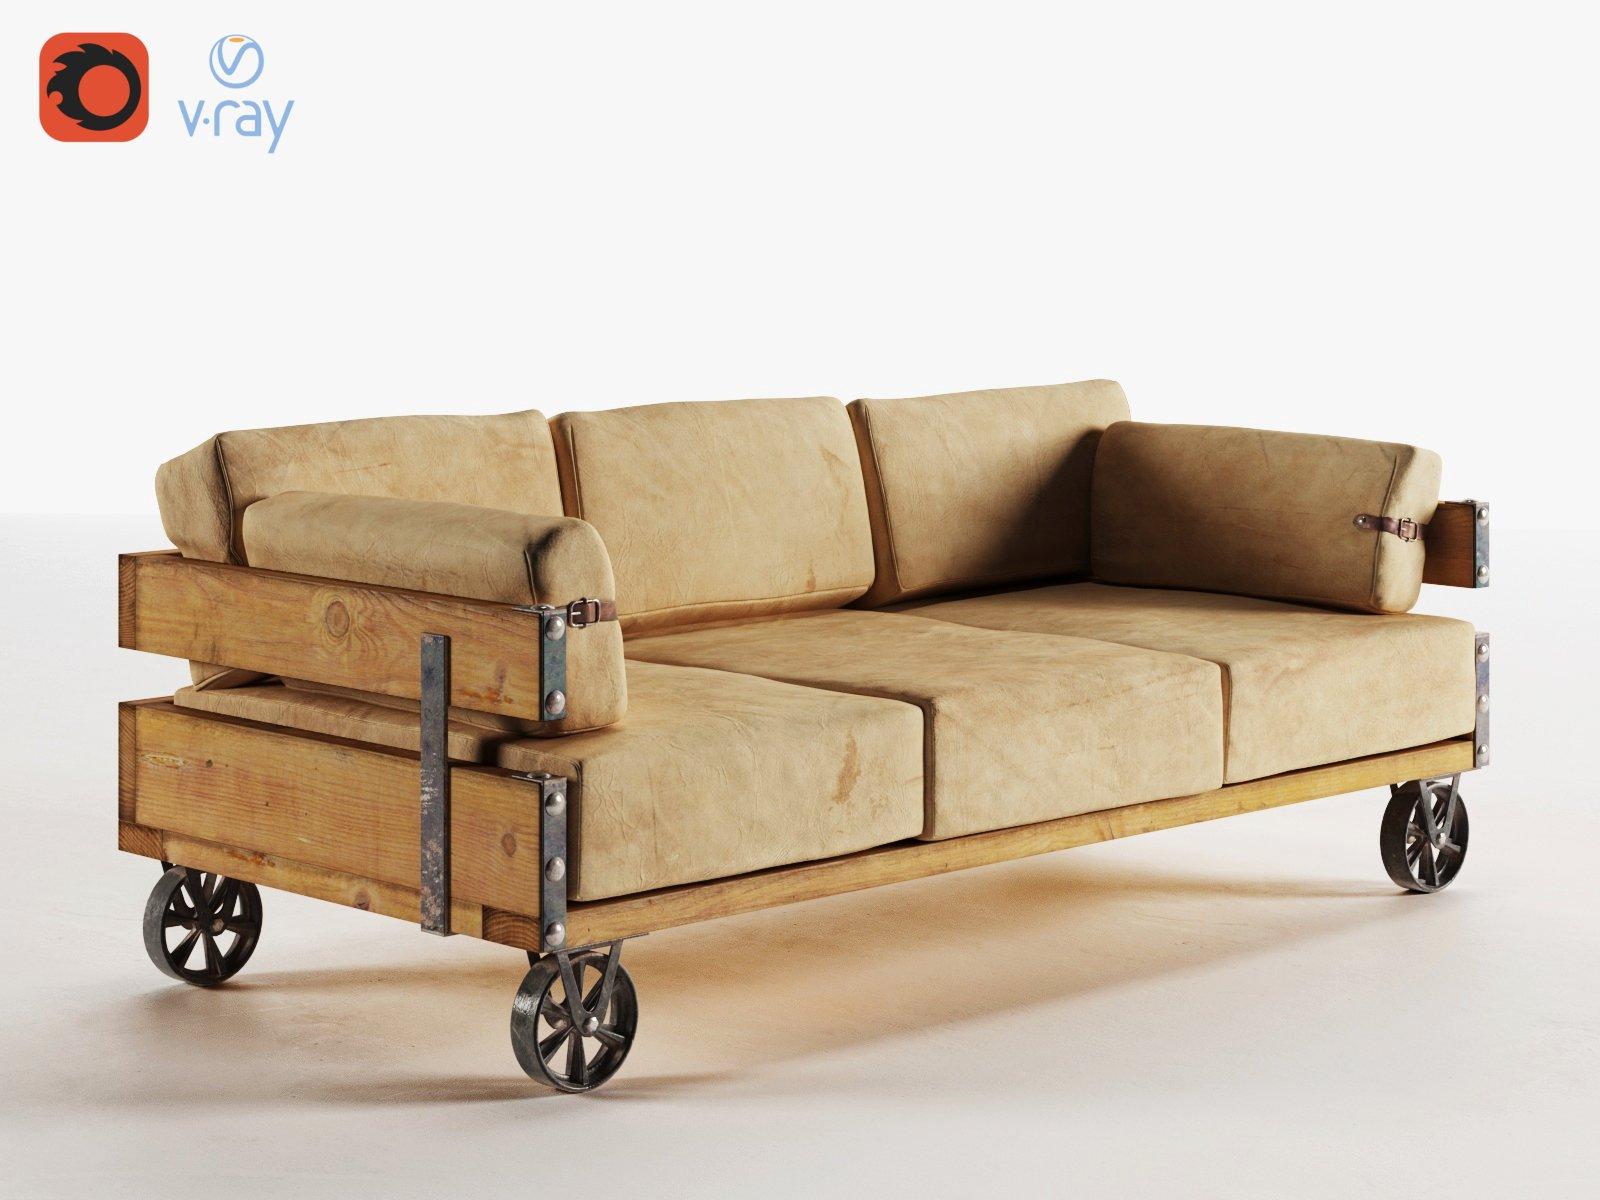 industrial sofa v ray corona 3d furniture models creative market. Black Bedroom Furniture Sets. Home Design Ideas